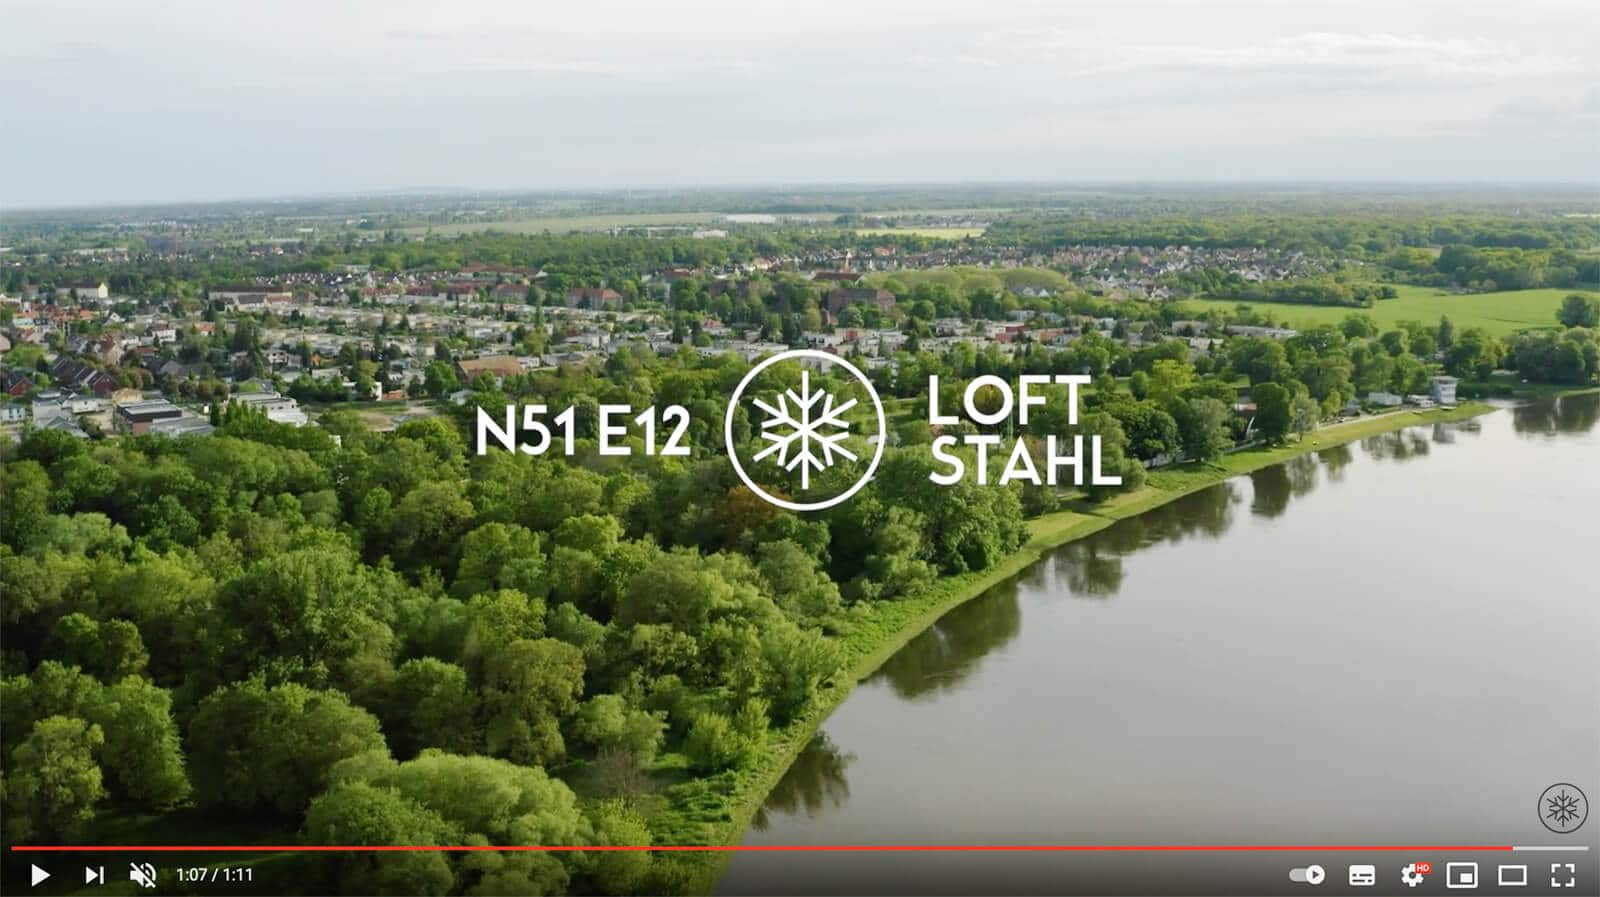 N51E12 Loftstahl Loft-Stahl.de Image Video made in Dessau, Stahlbau, Stahl Loft Tür, Lofttür, Designtür, Bauhaus Design, Bauhaustür